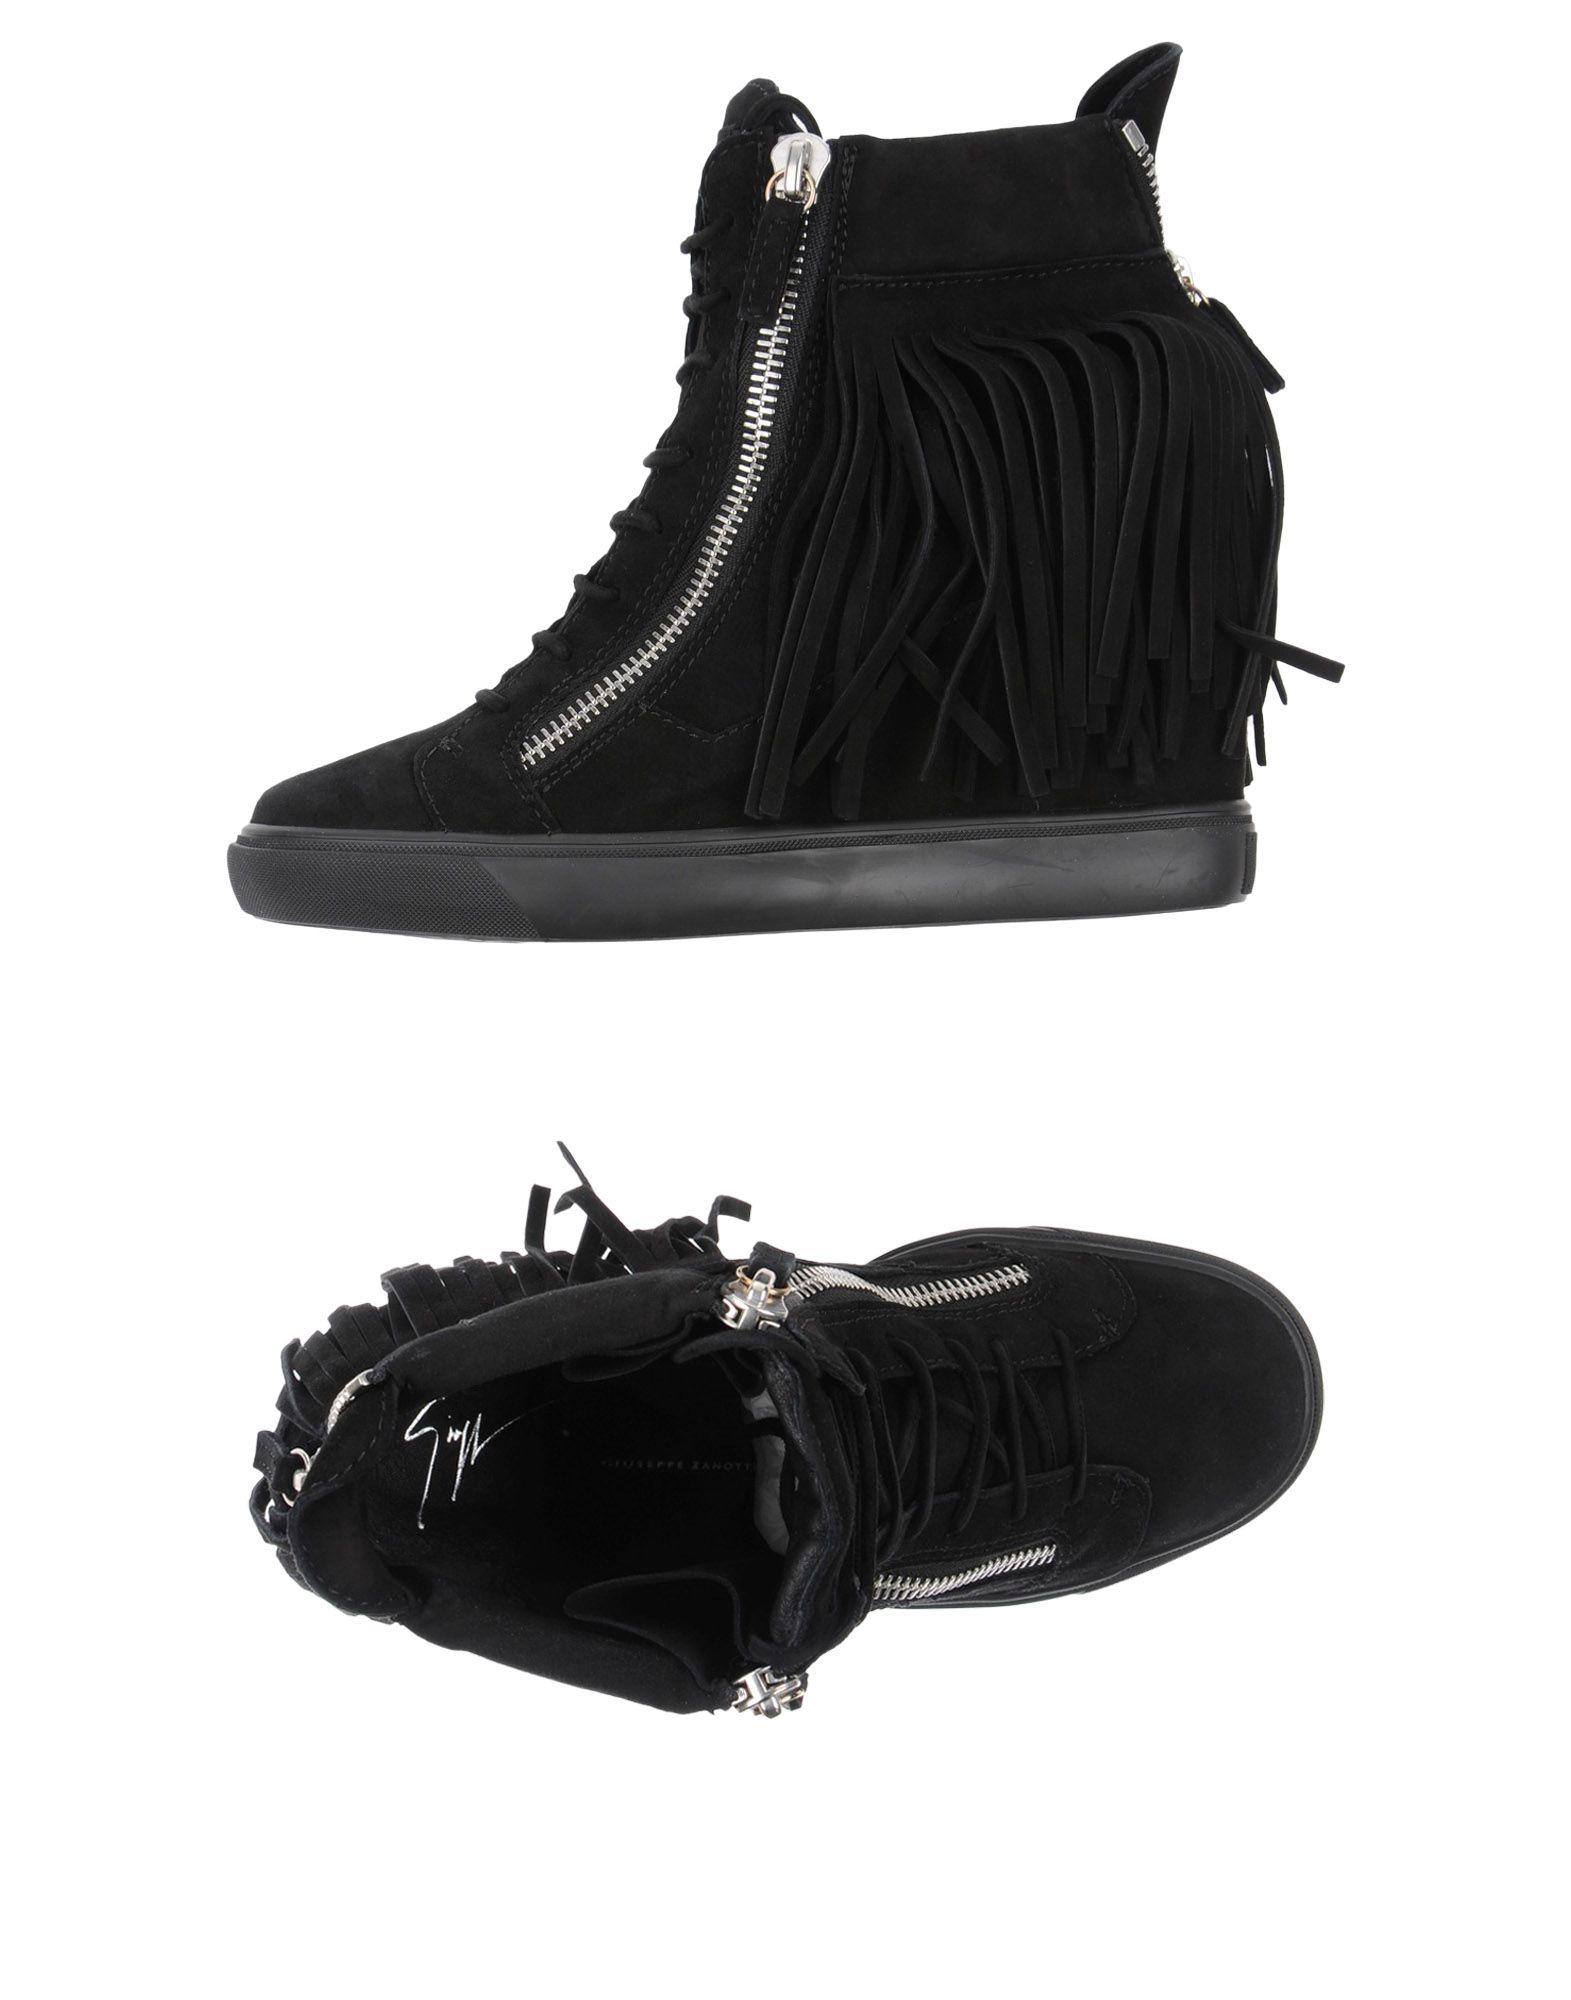 GIUSEPPE ZANOTTI DESIGN Damen High Sneakers & Tennisschuhe Farbe Schwarz Größe 15